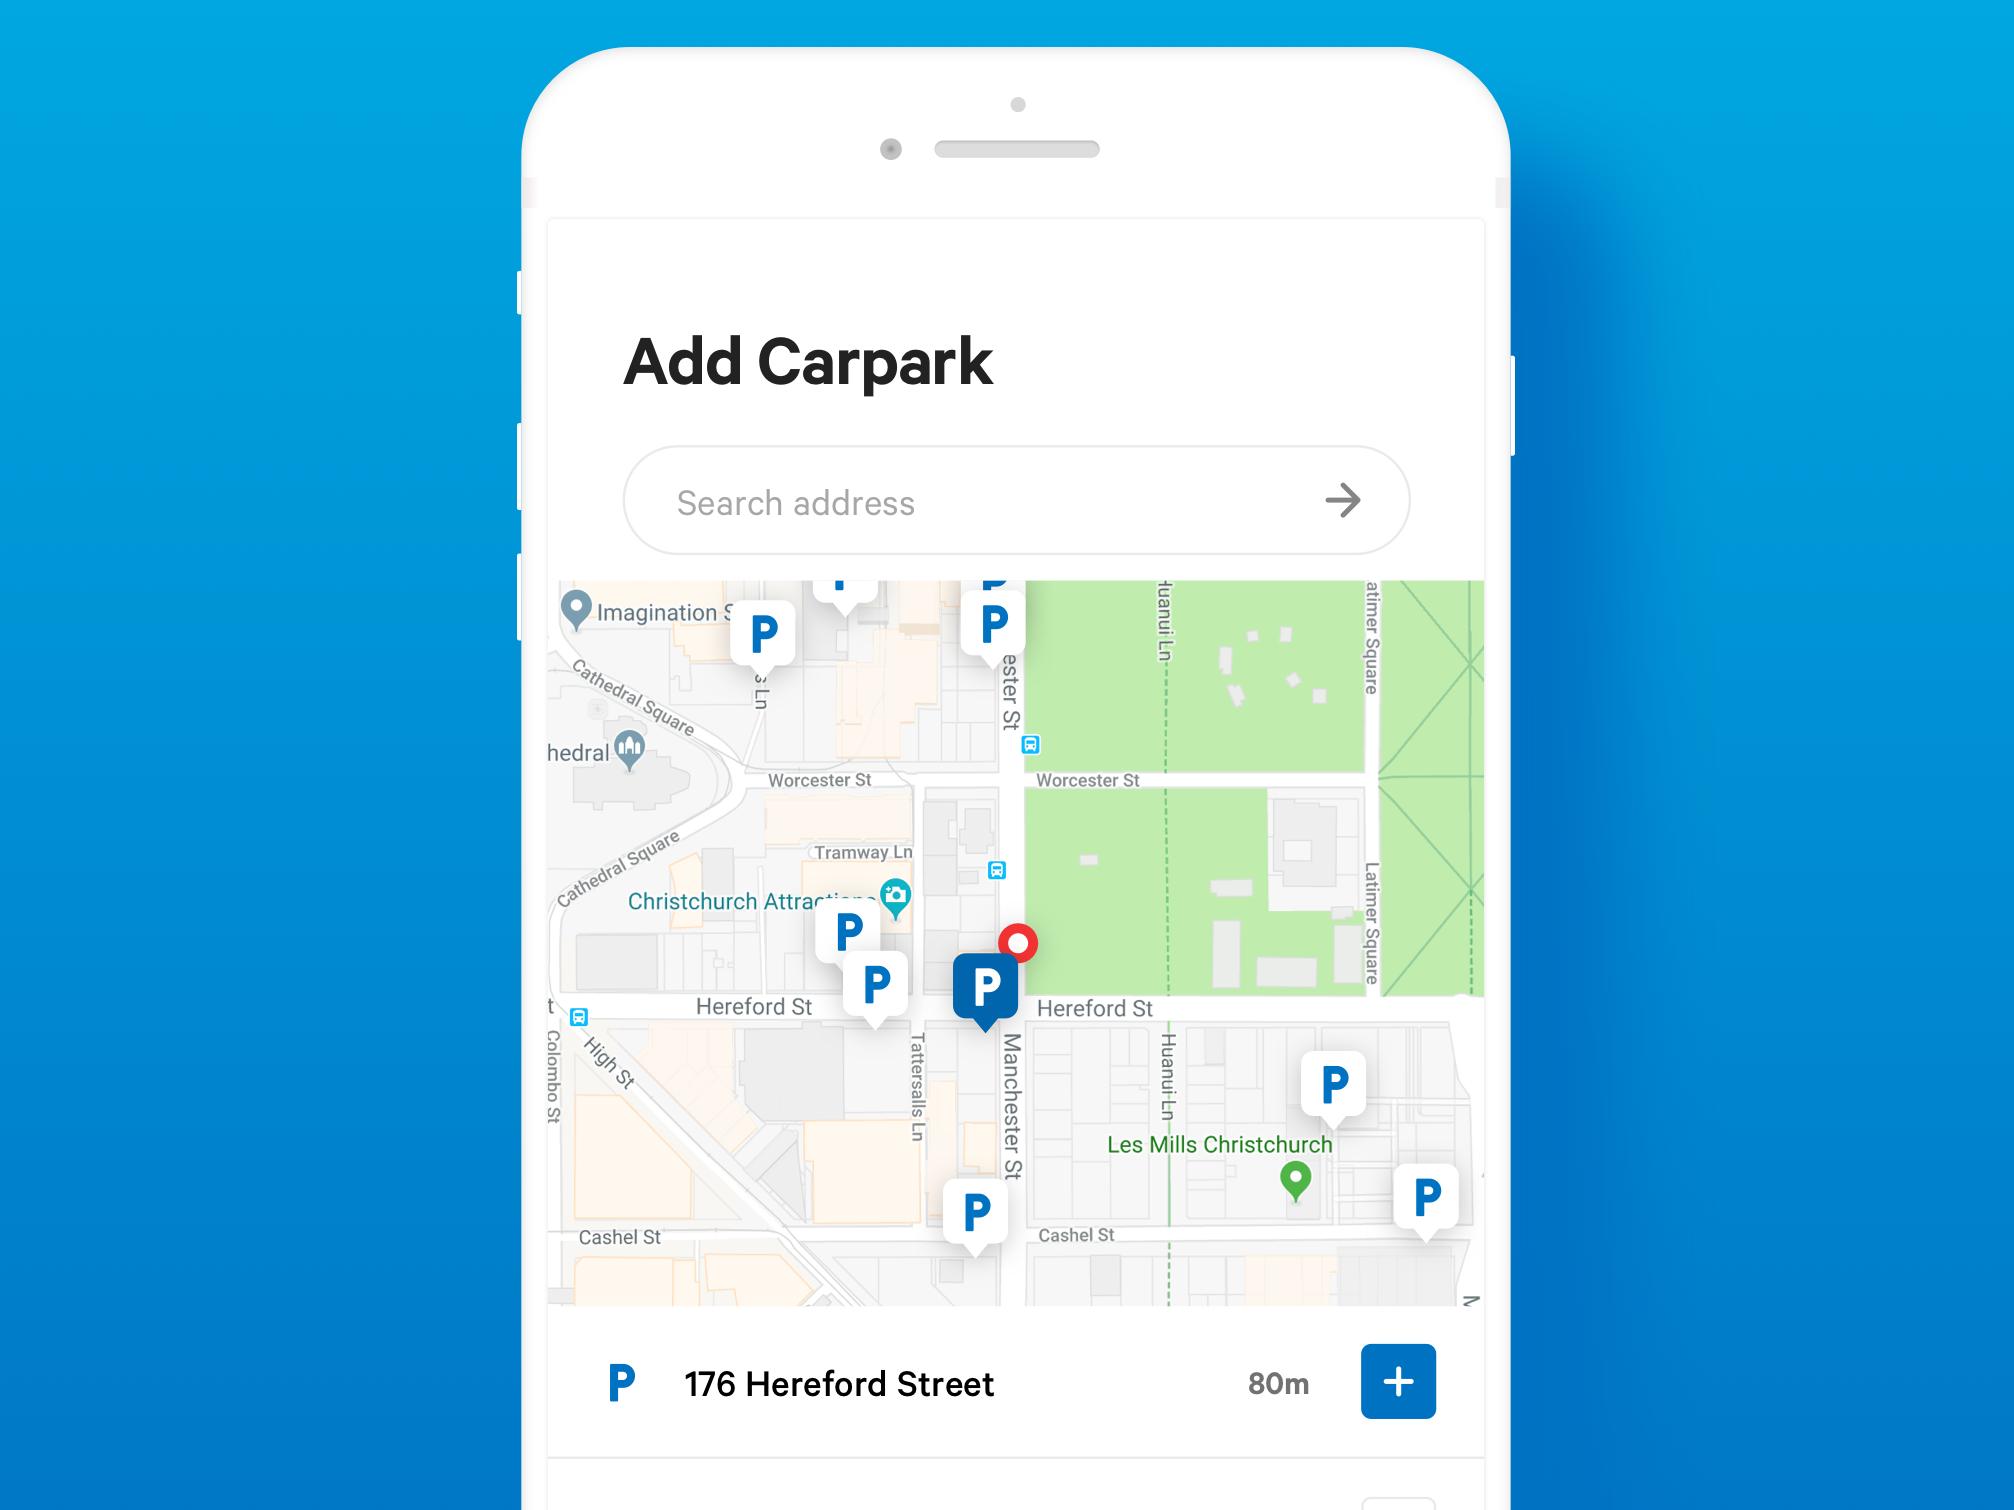 Add carpark